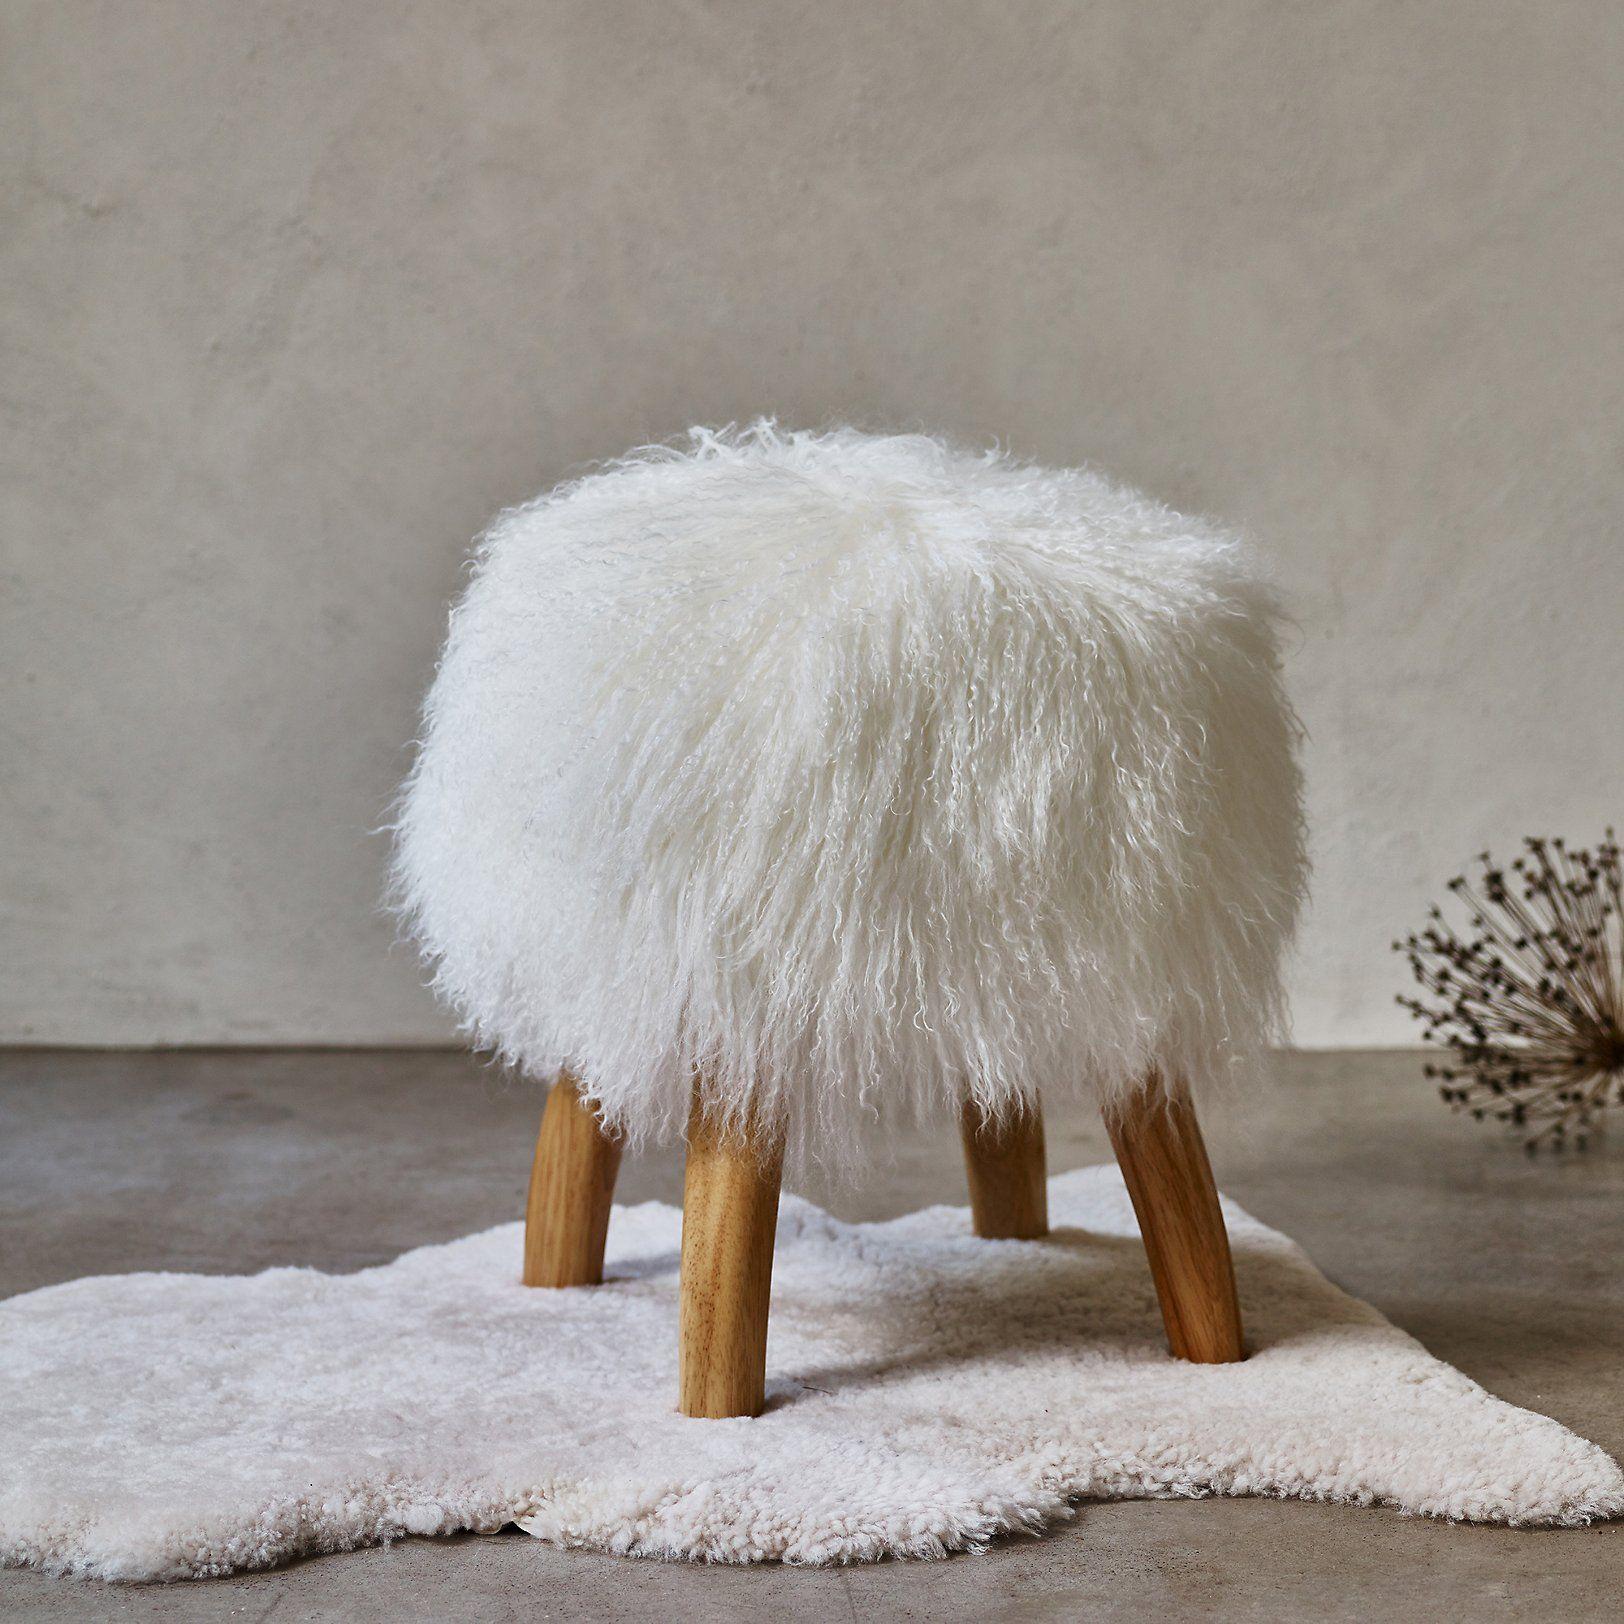 Tibetan Sheepskin Stool | Chairs, Benches & Stools | The ...